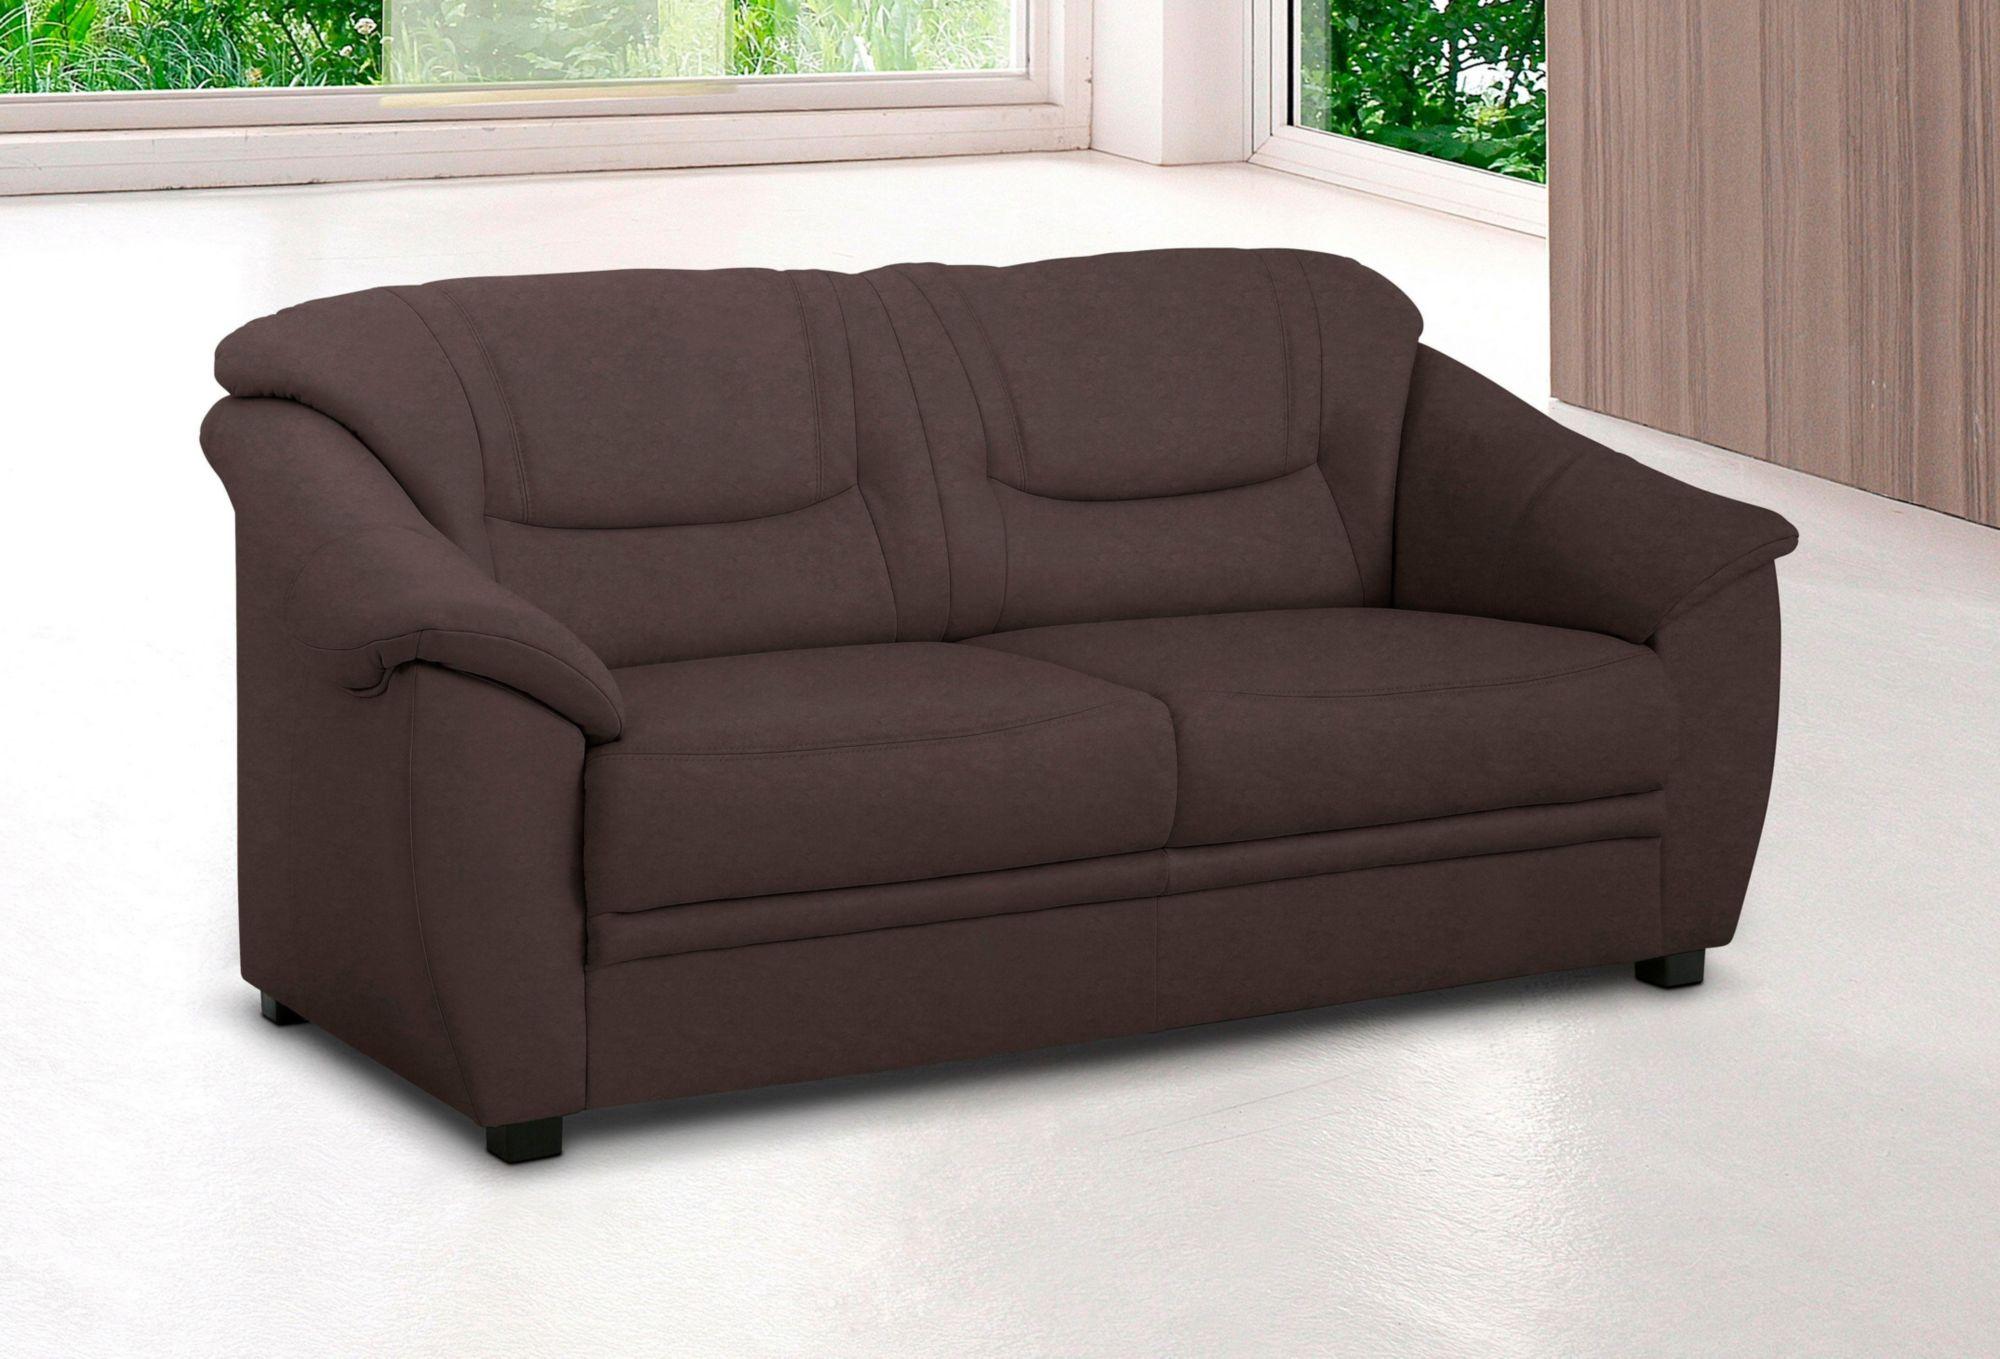 SITMORE 3-Sitzer, Sit & More